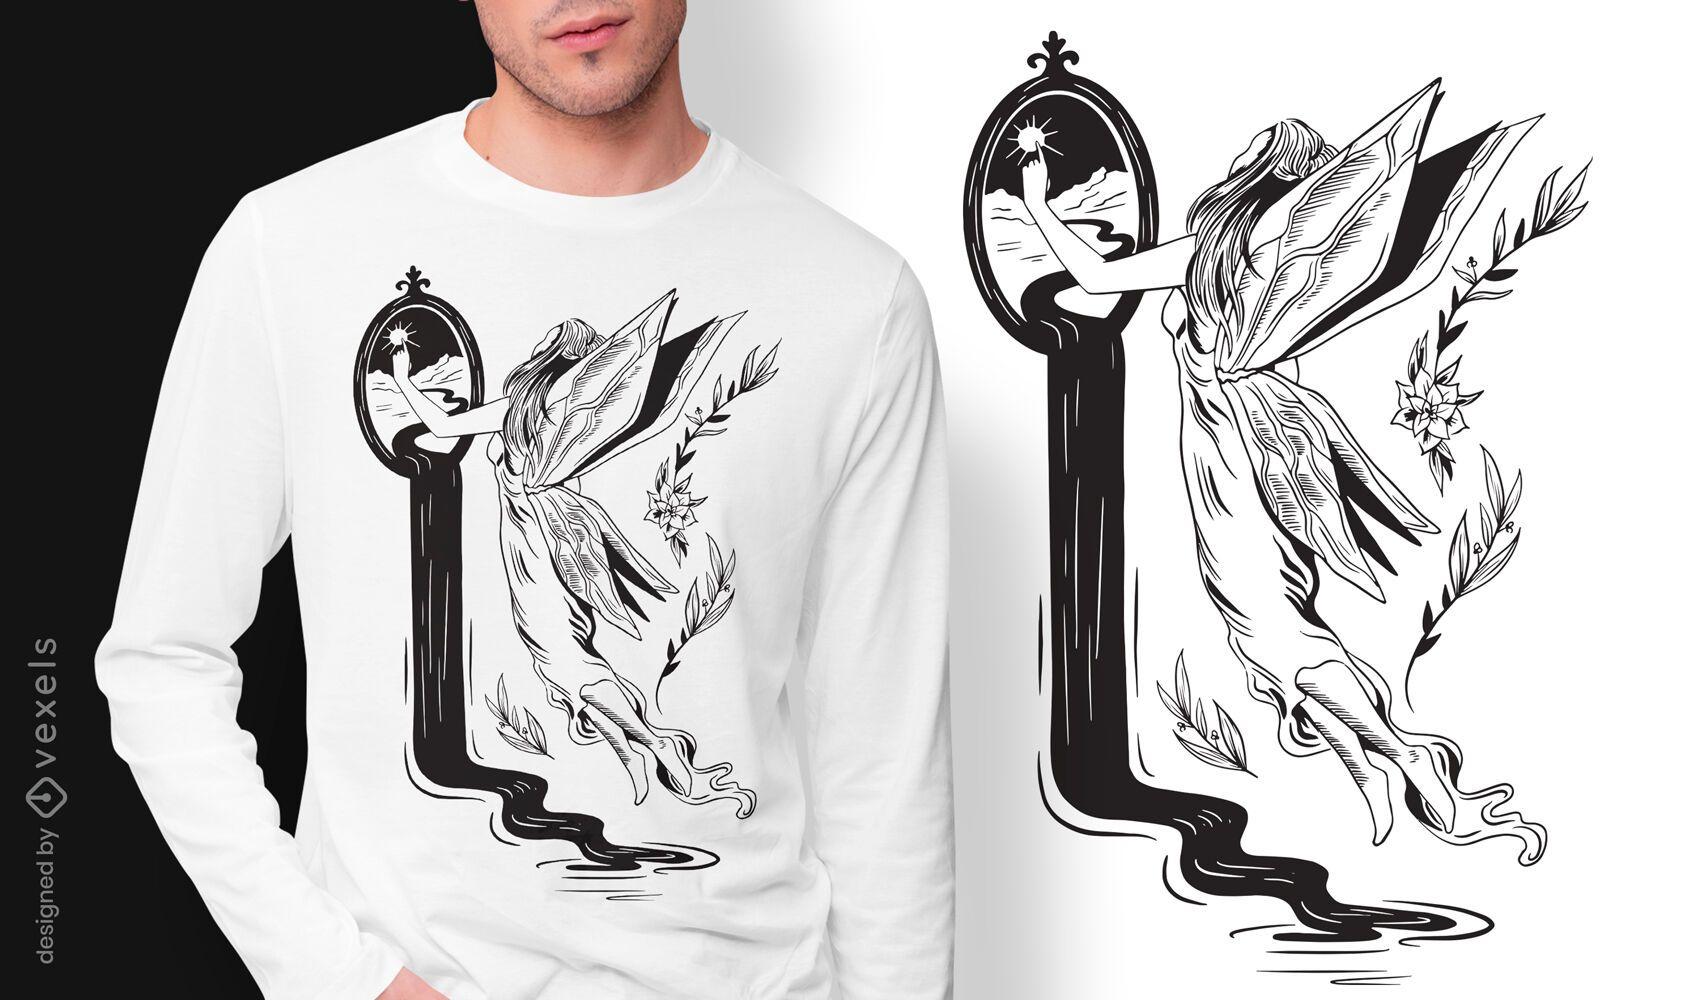 Fantasy fairy dark art nouveau t-shirt design